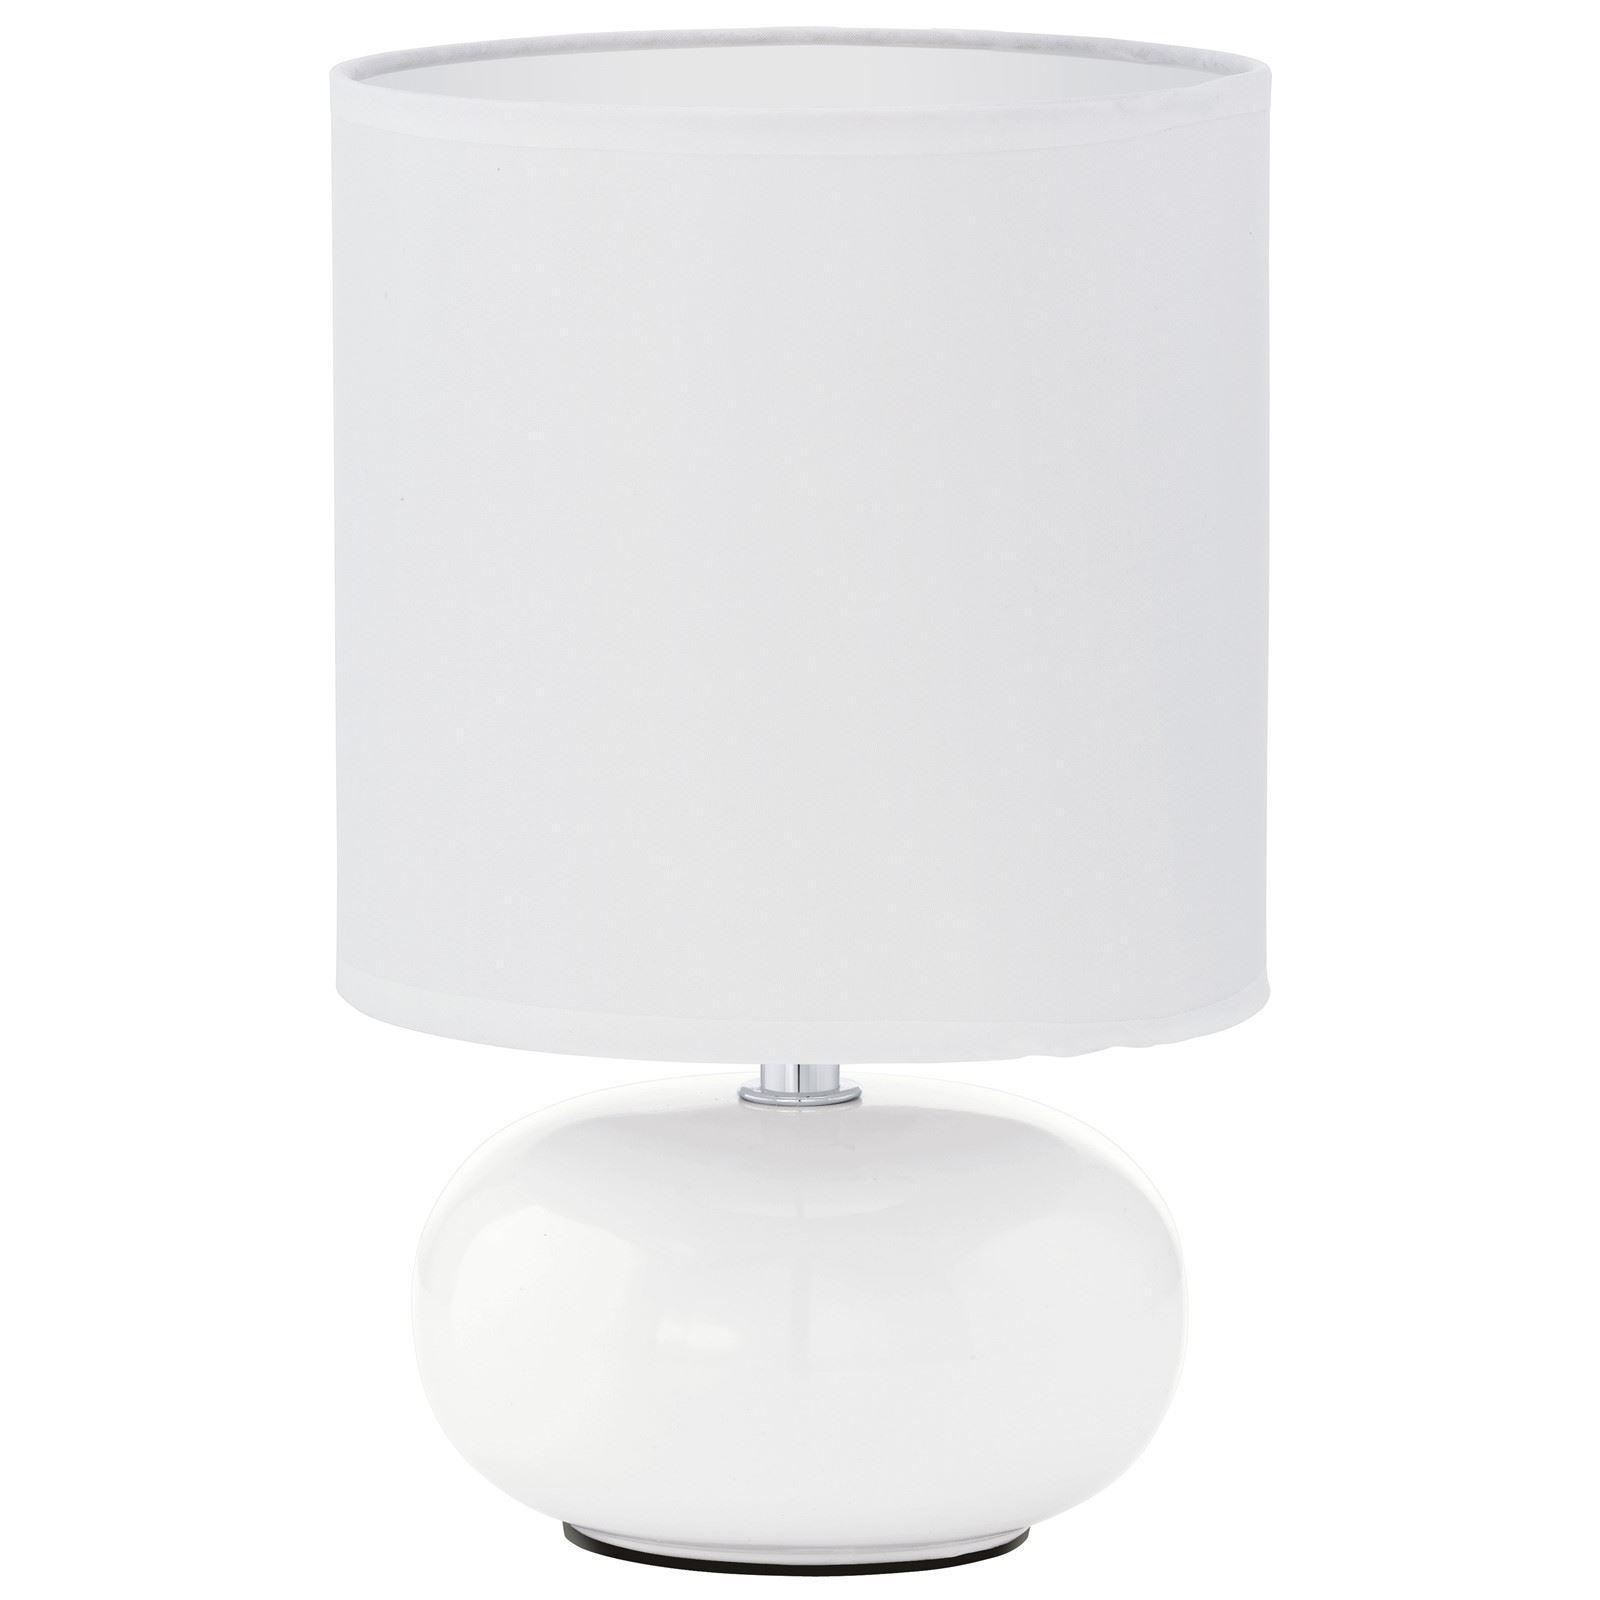 Trondio Ceramic White Table Lamp 1 Light E14 With Fabric Shade